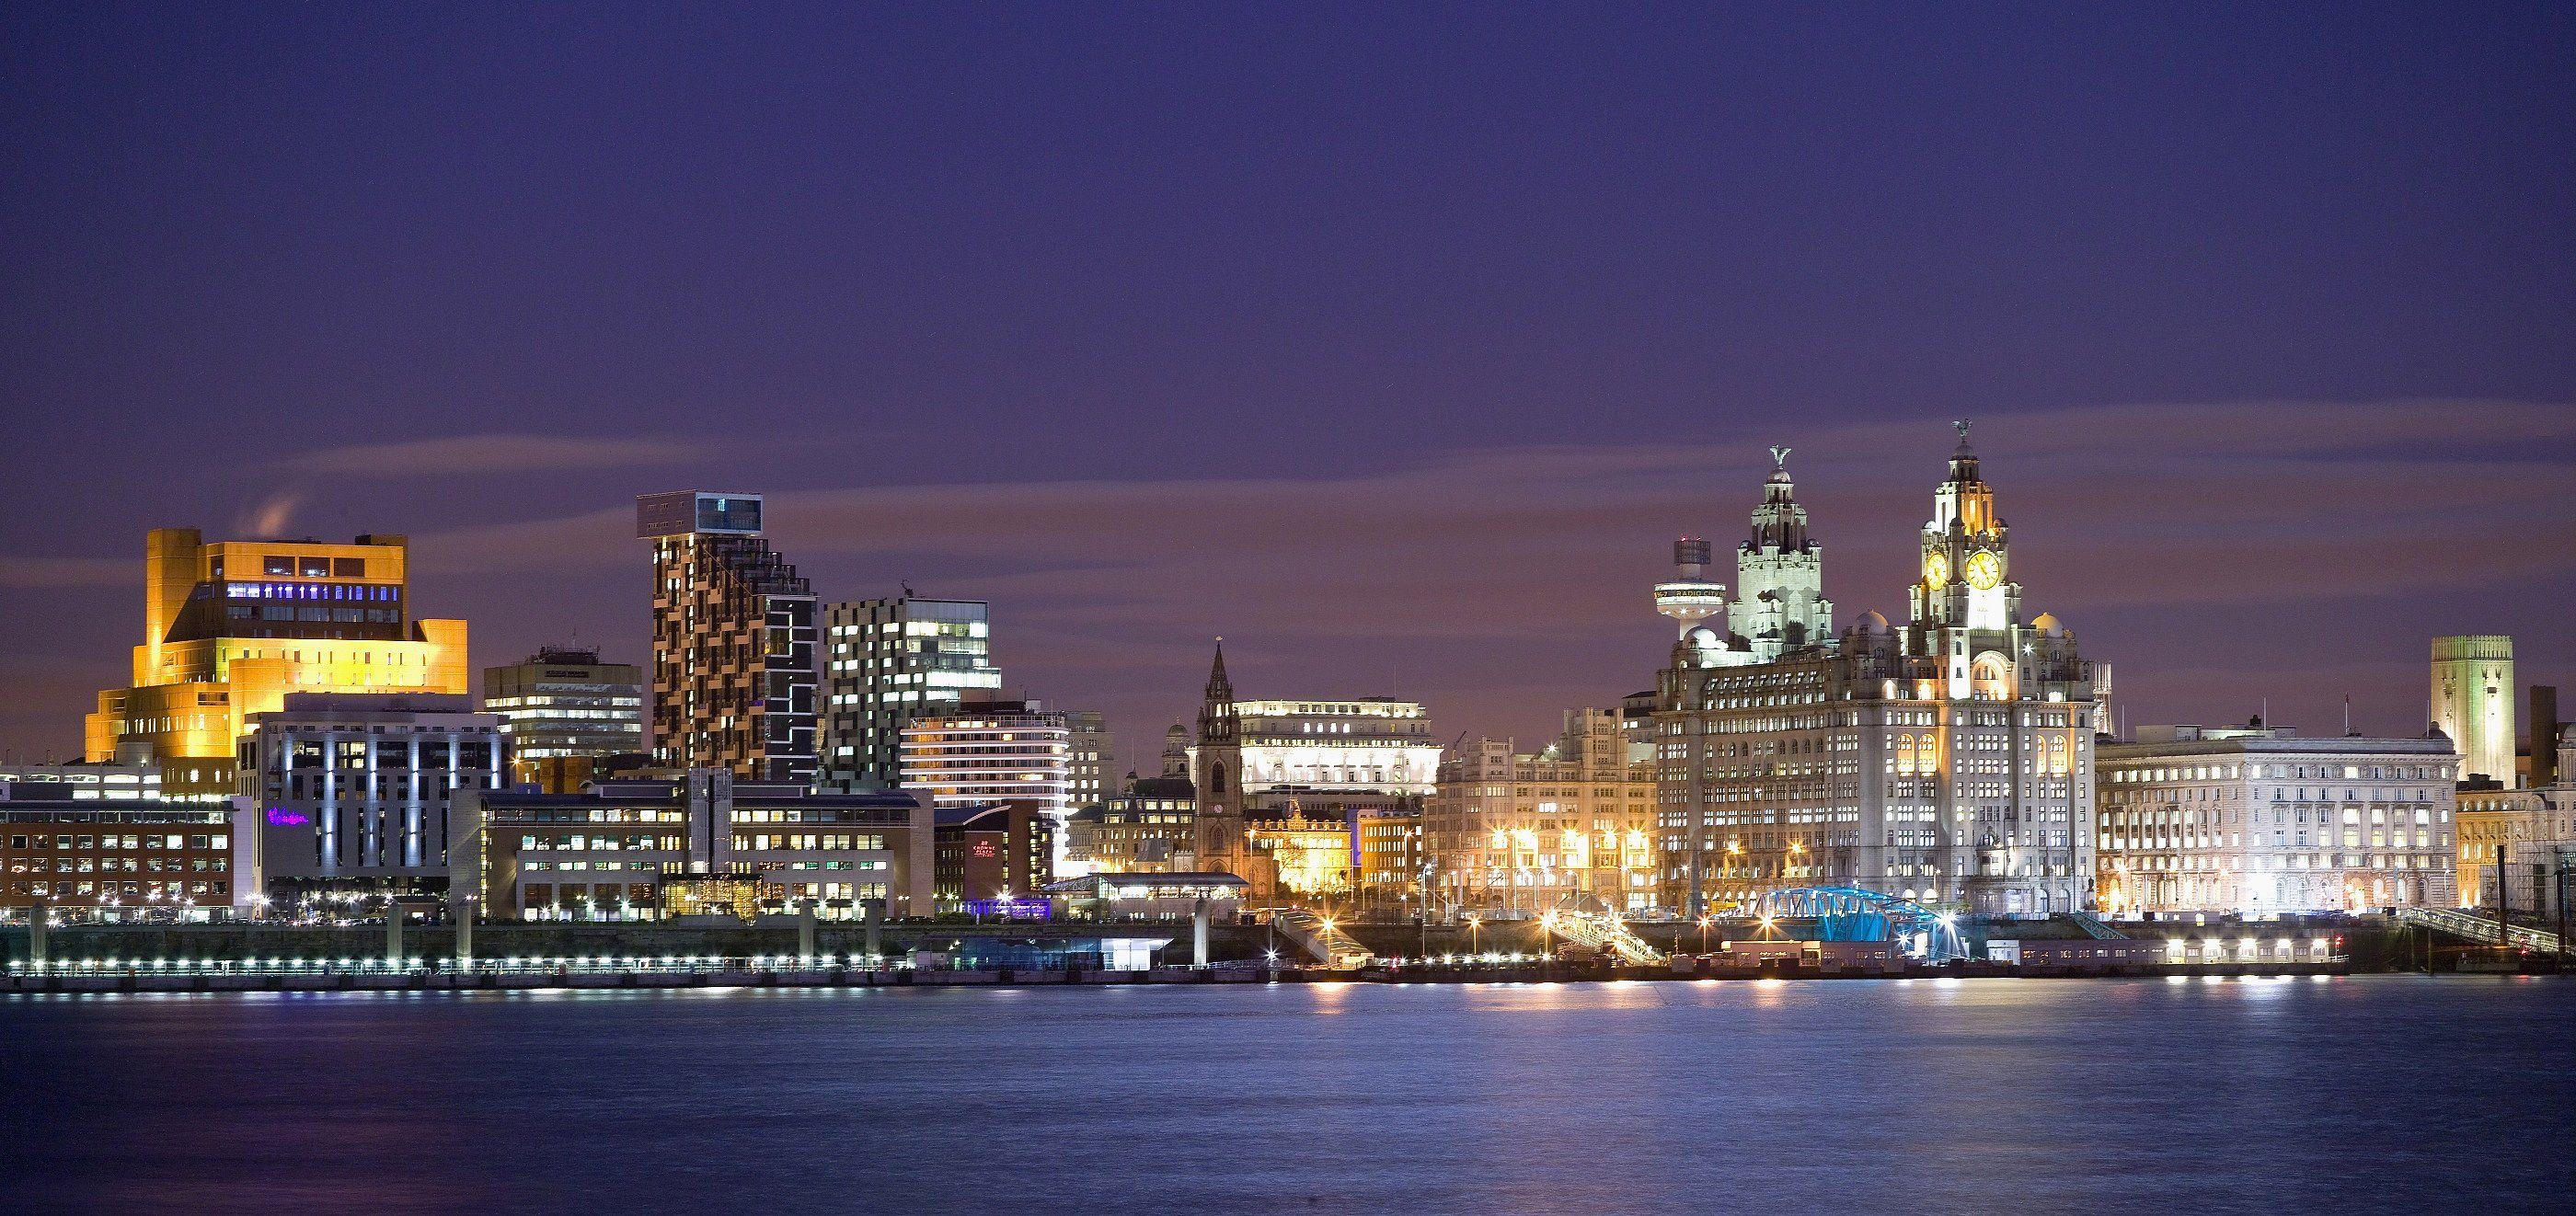 Liverpool Uk Liverpool Skyline Liverpool City Liverpool Waterfront